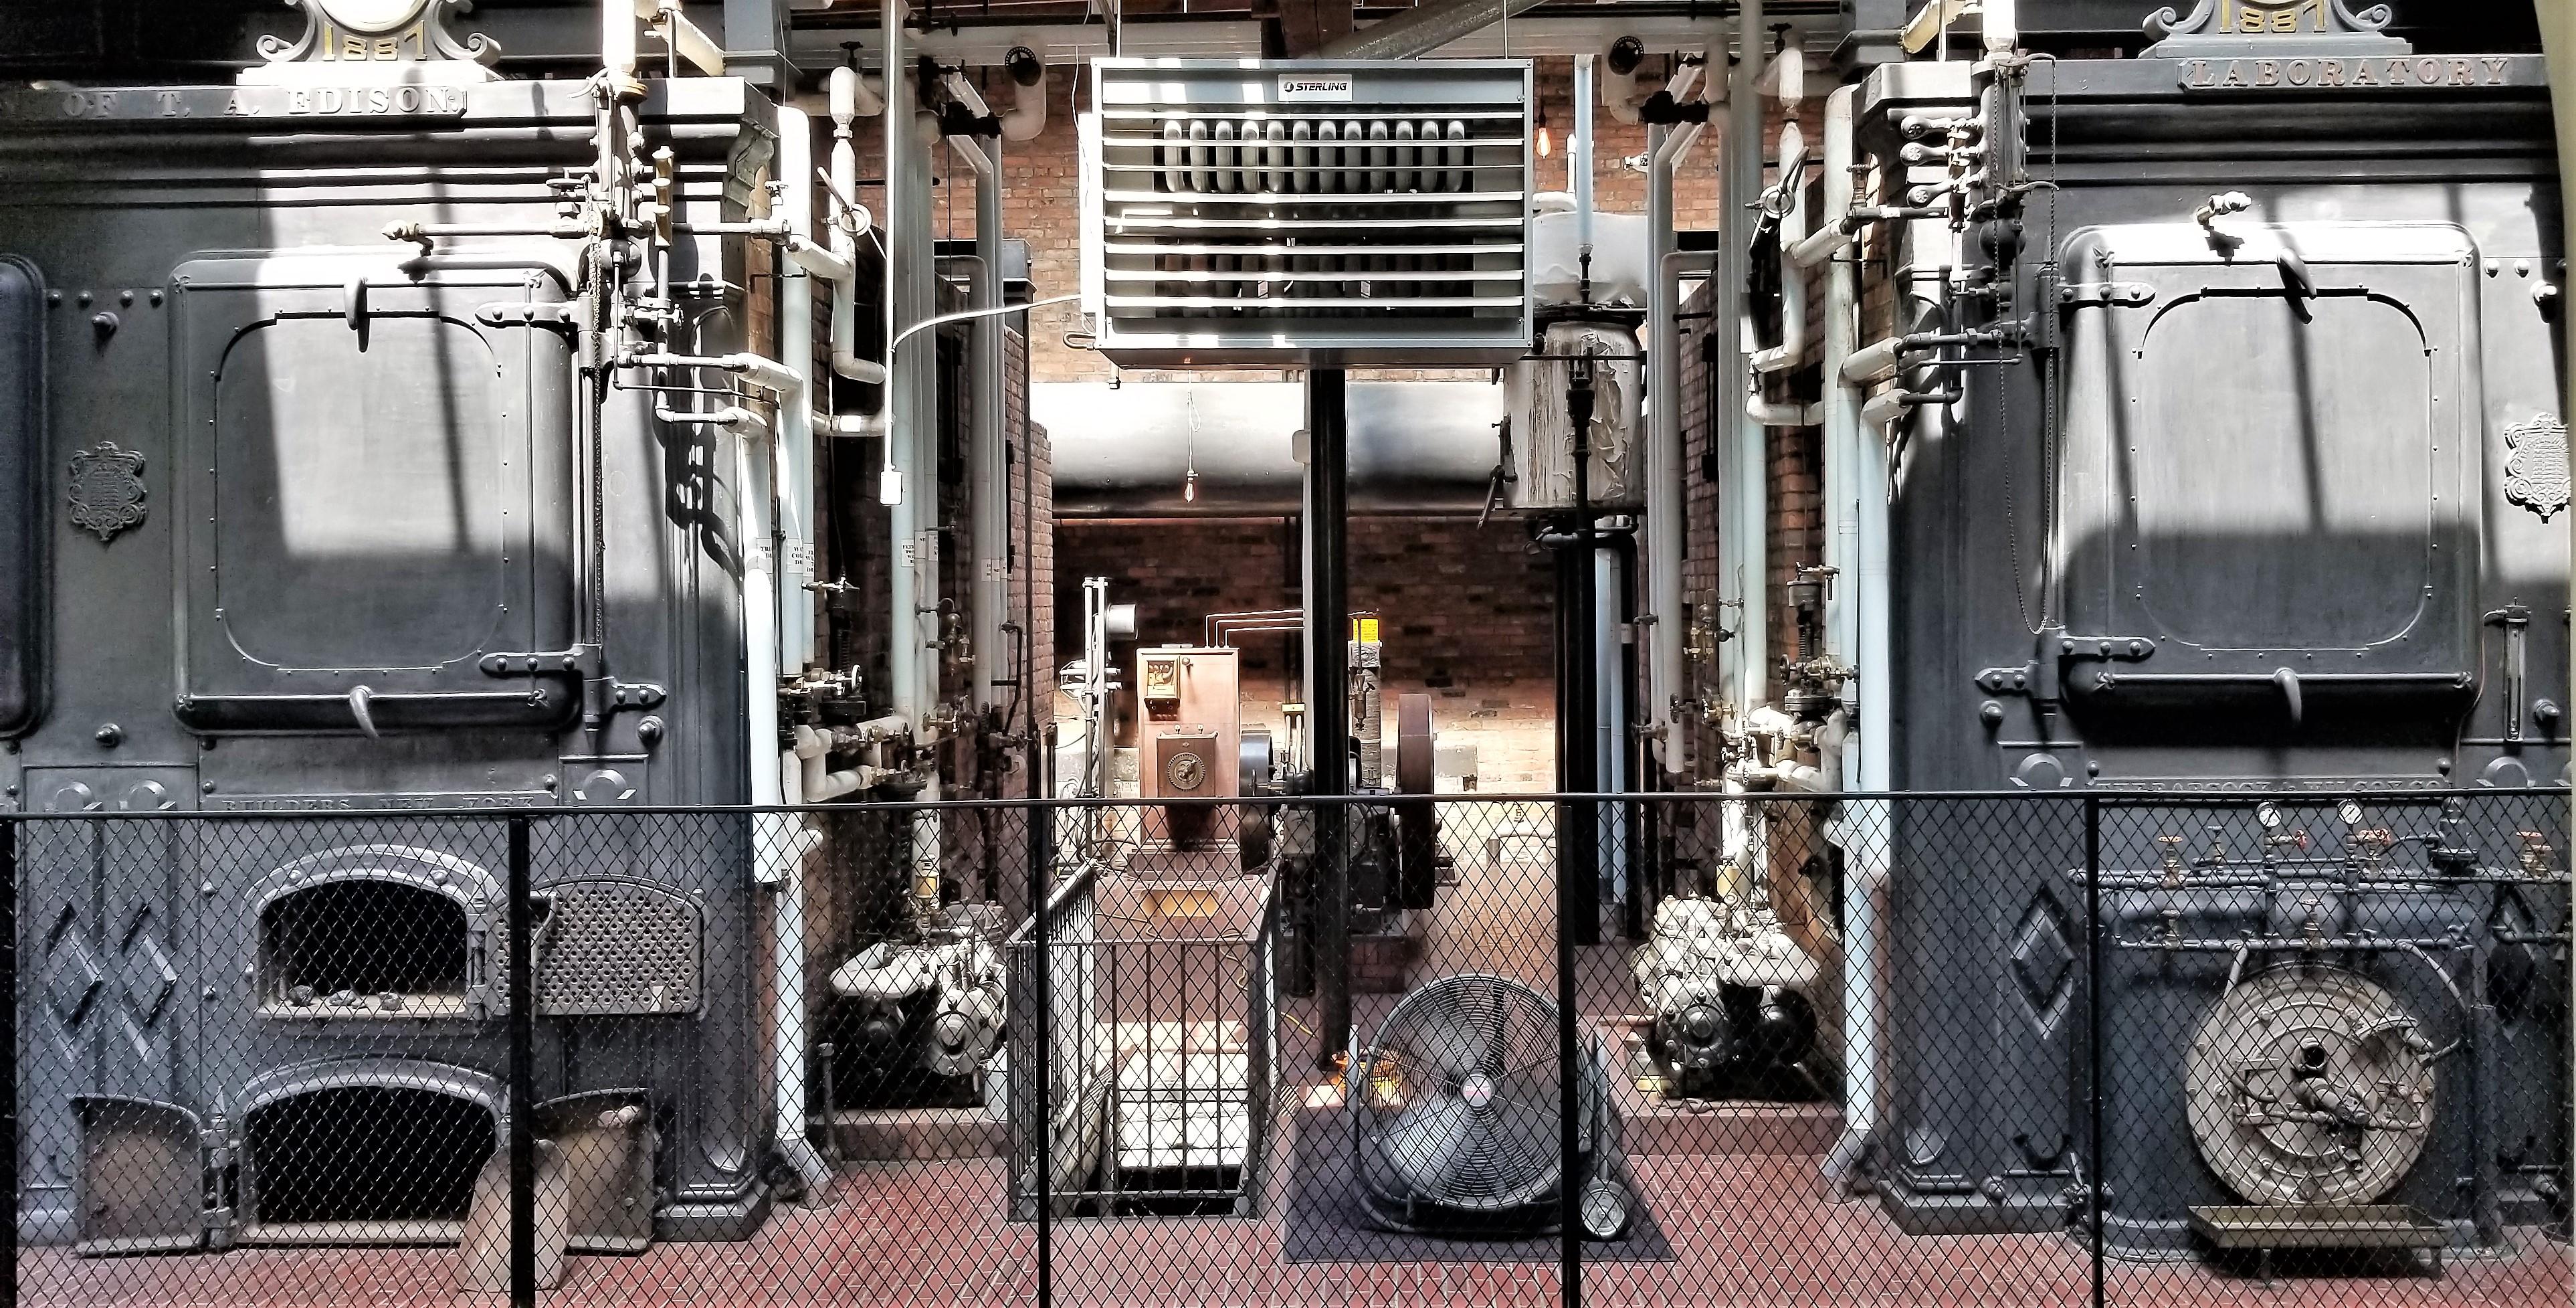 Edison generators